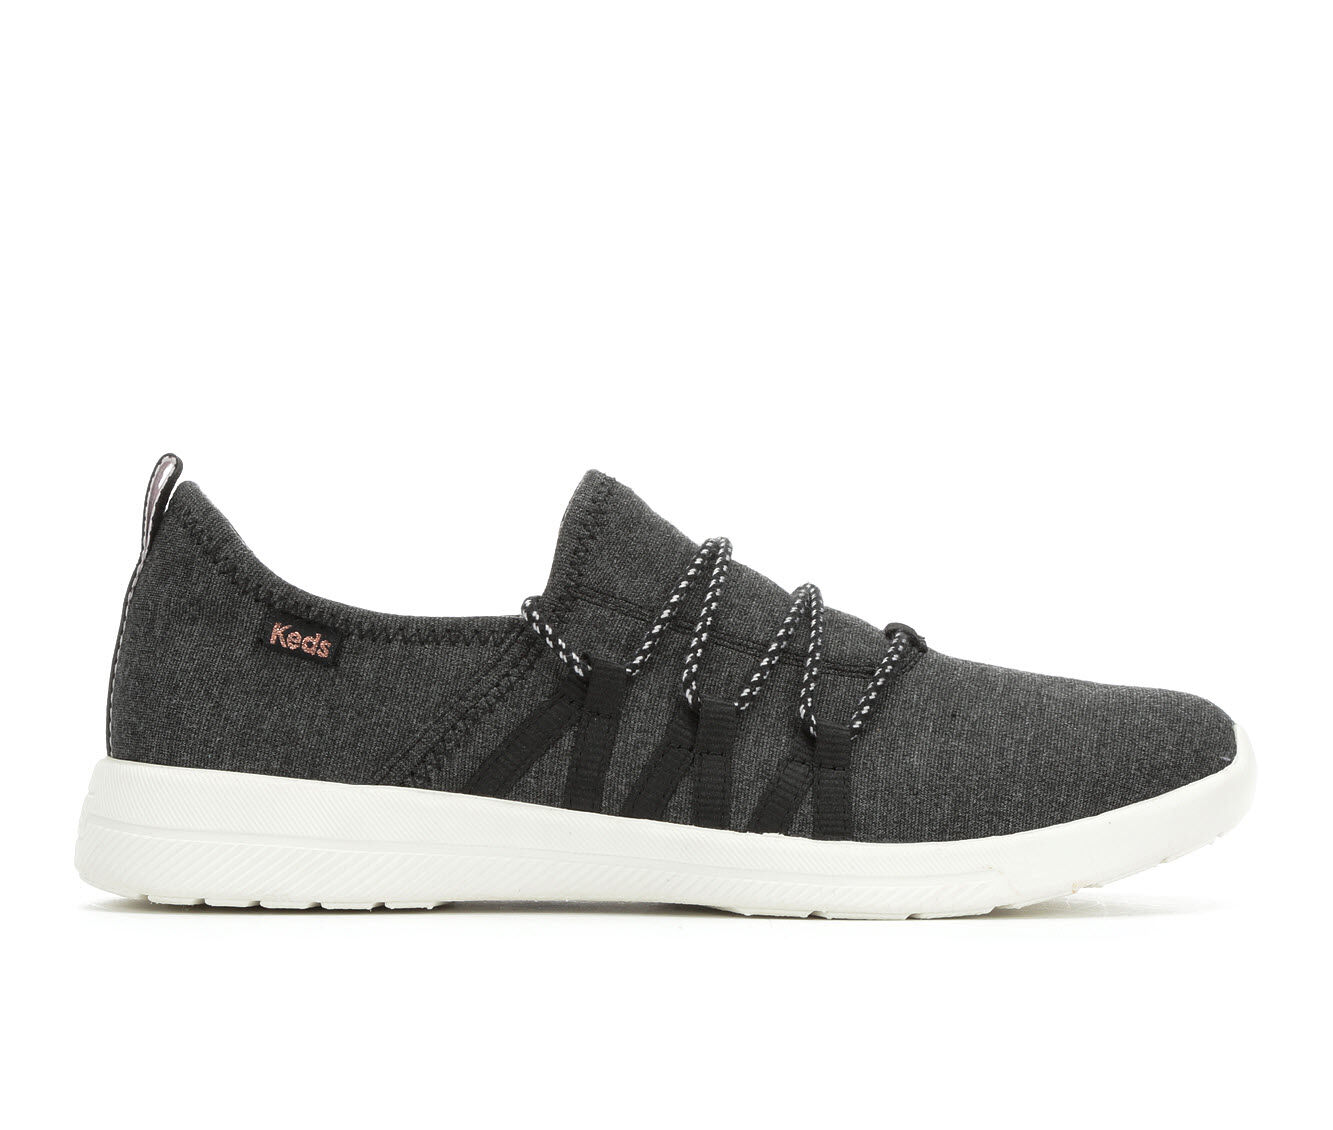 uk shoes_kd4554